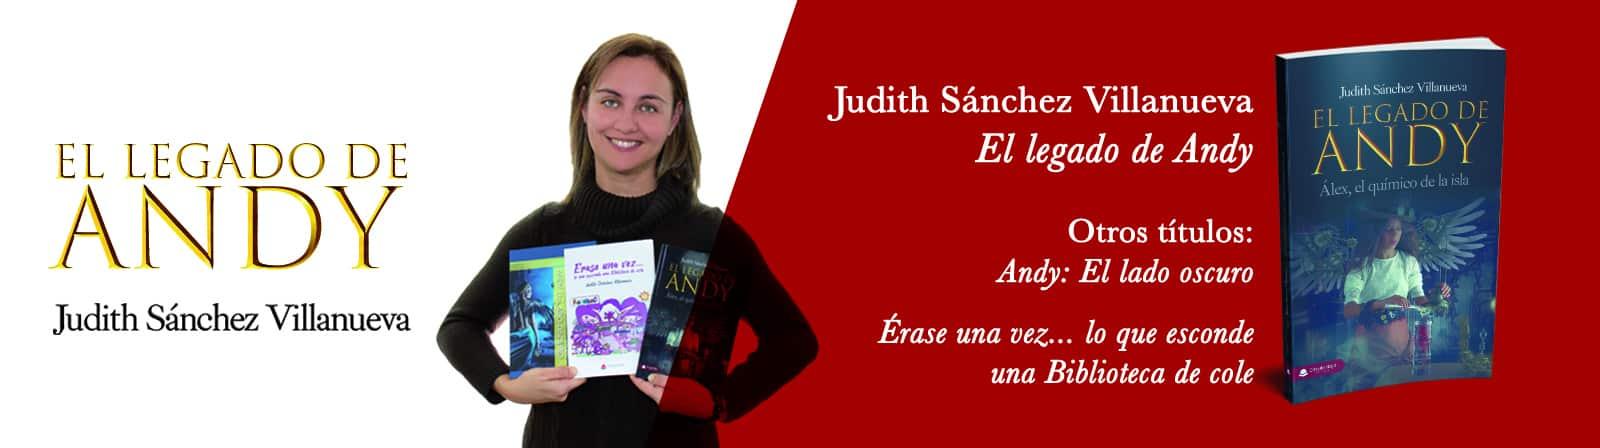 _Judith Sánchez Villanueva- Varios títulos